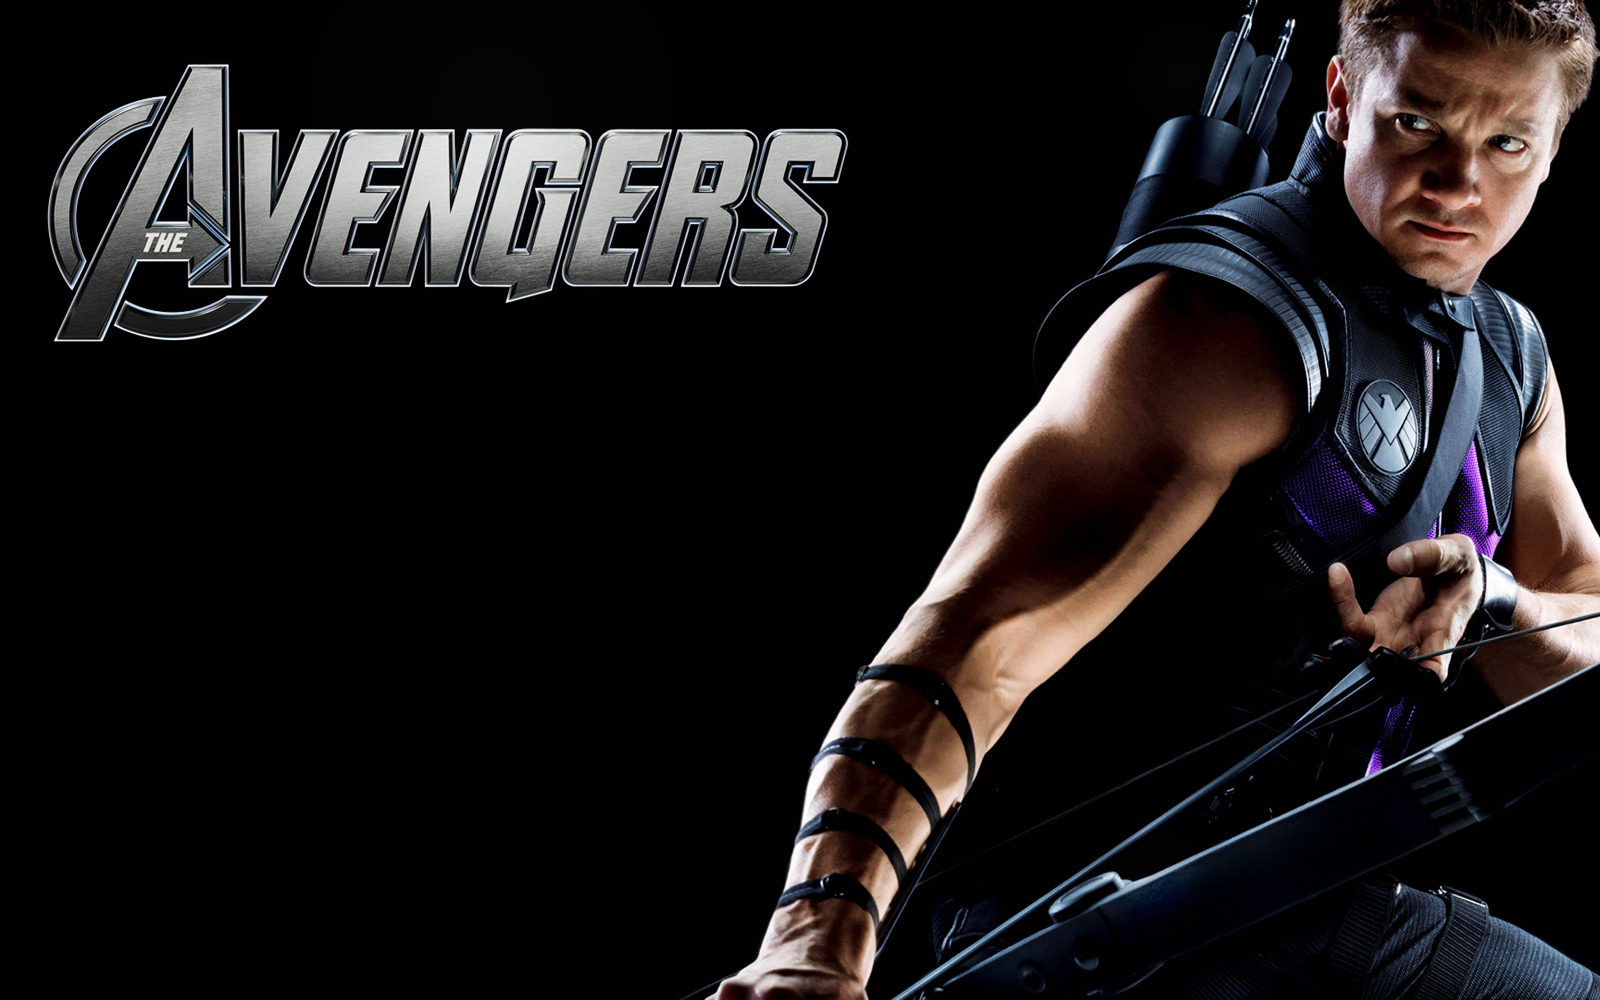 Download image Download Hawkeye Wallpaper Avengers Marvel Movie 1600x1000